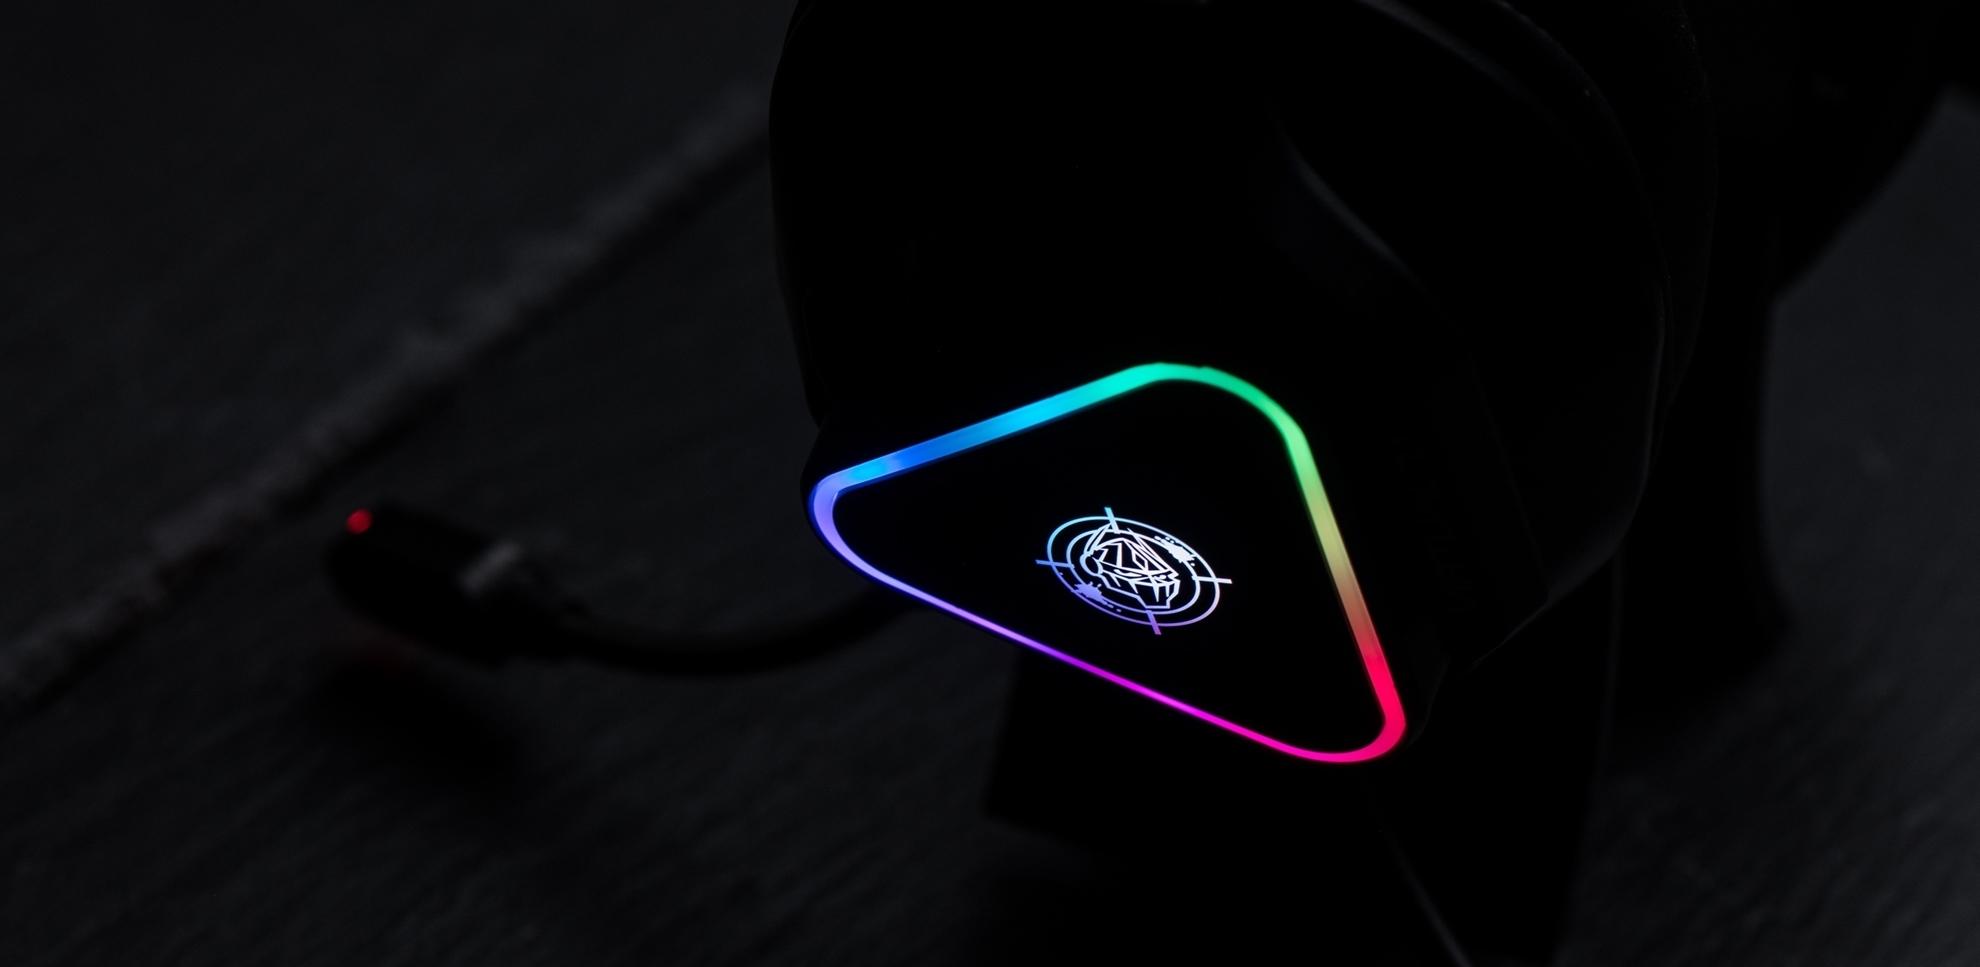 ZeroGround Akechi Pro - Gaming headset